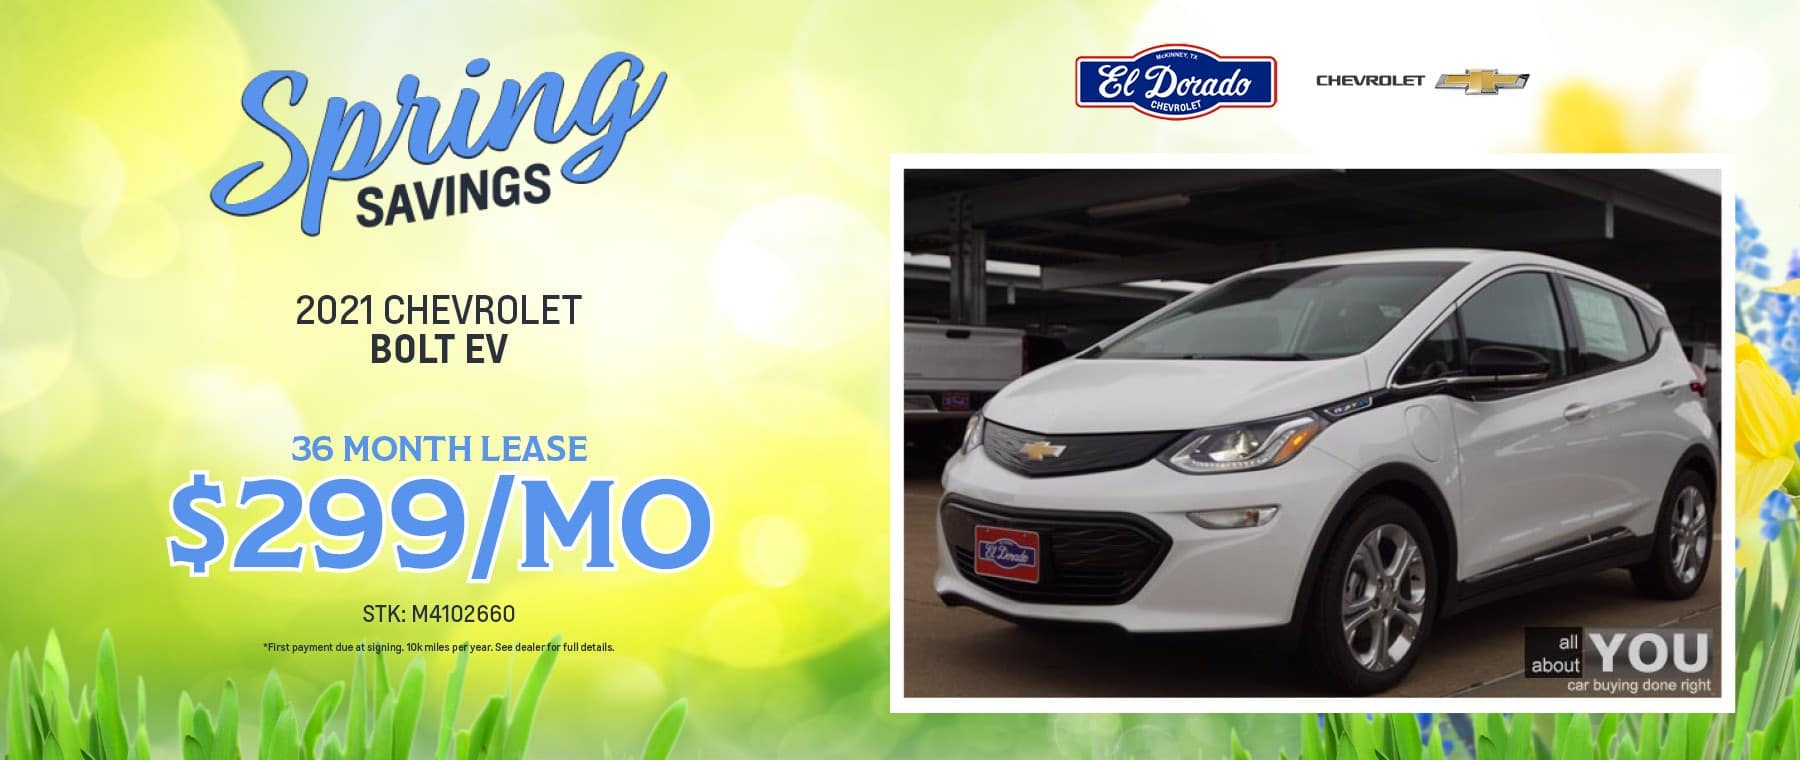 2021 Chevrolet Bolt EV Offer - El Dorado Chevrolet in McKinney, Texas